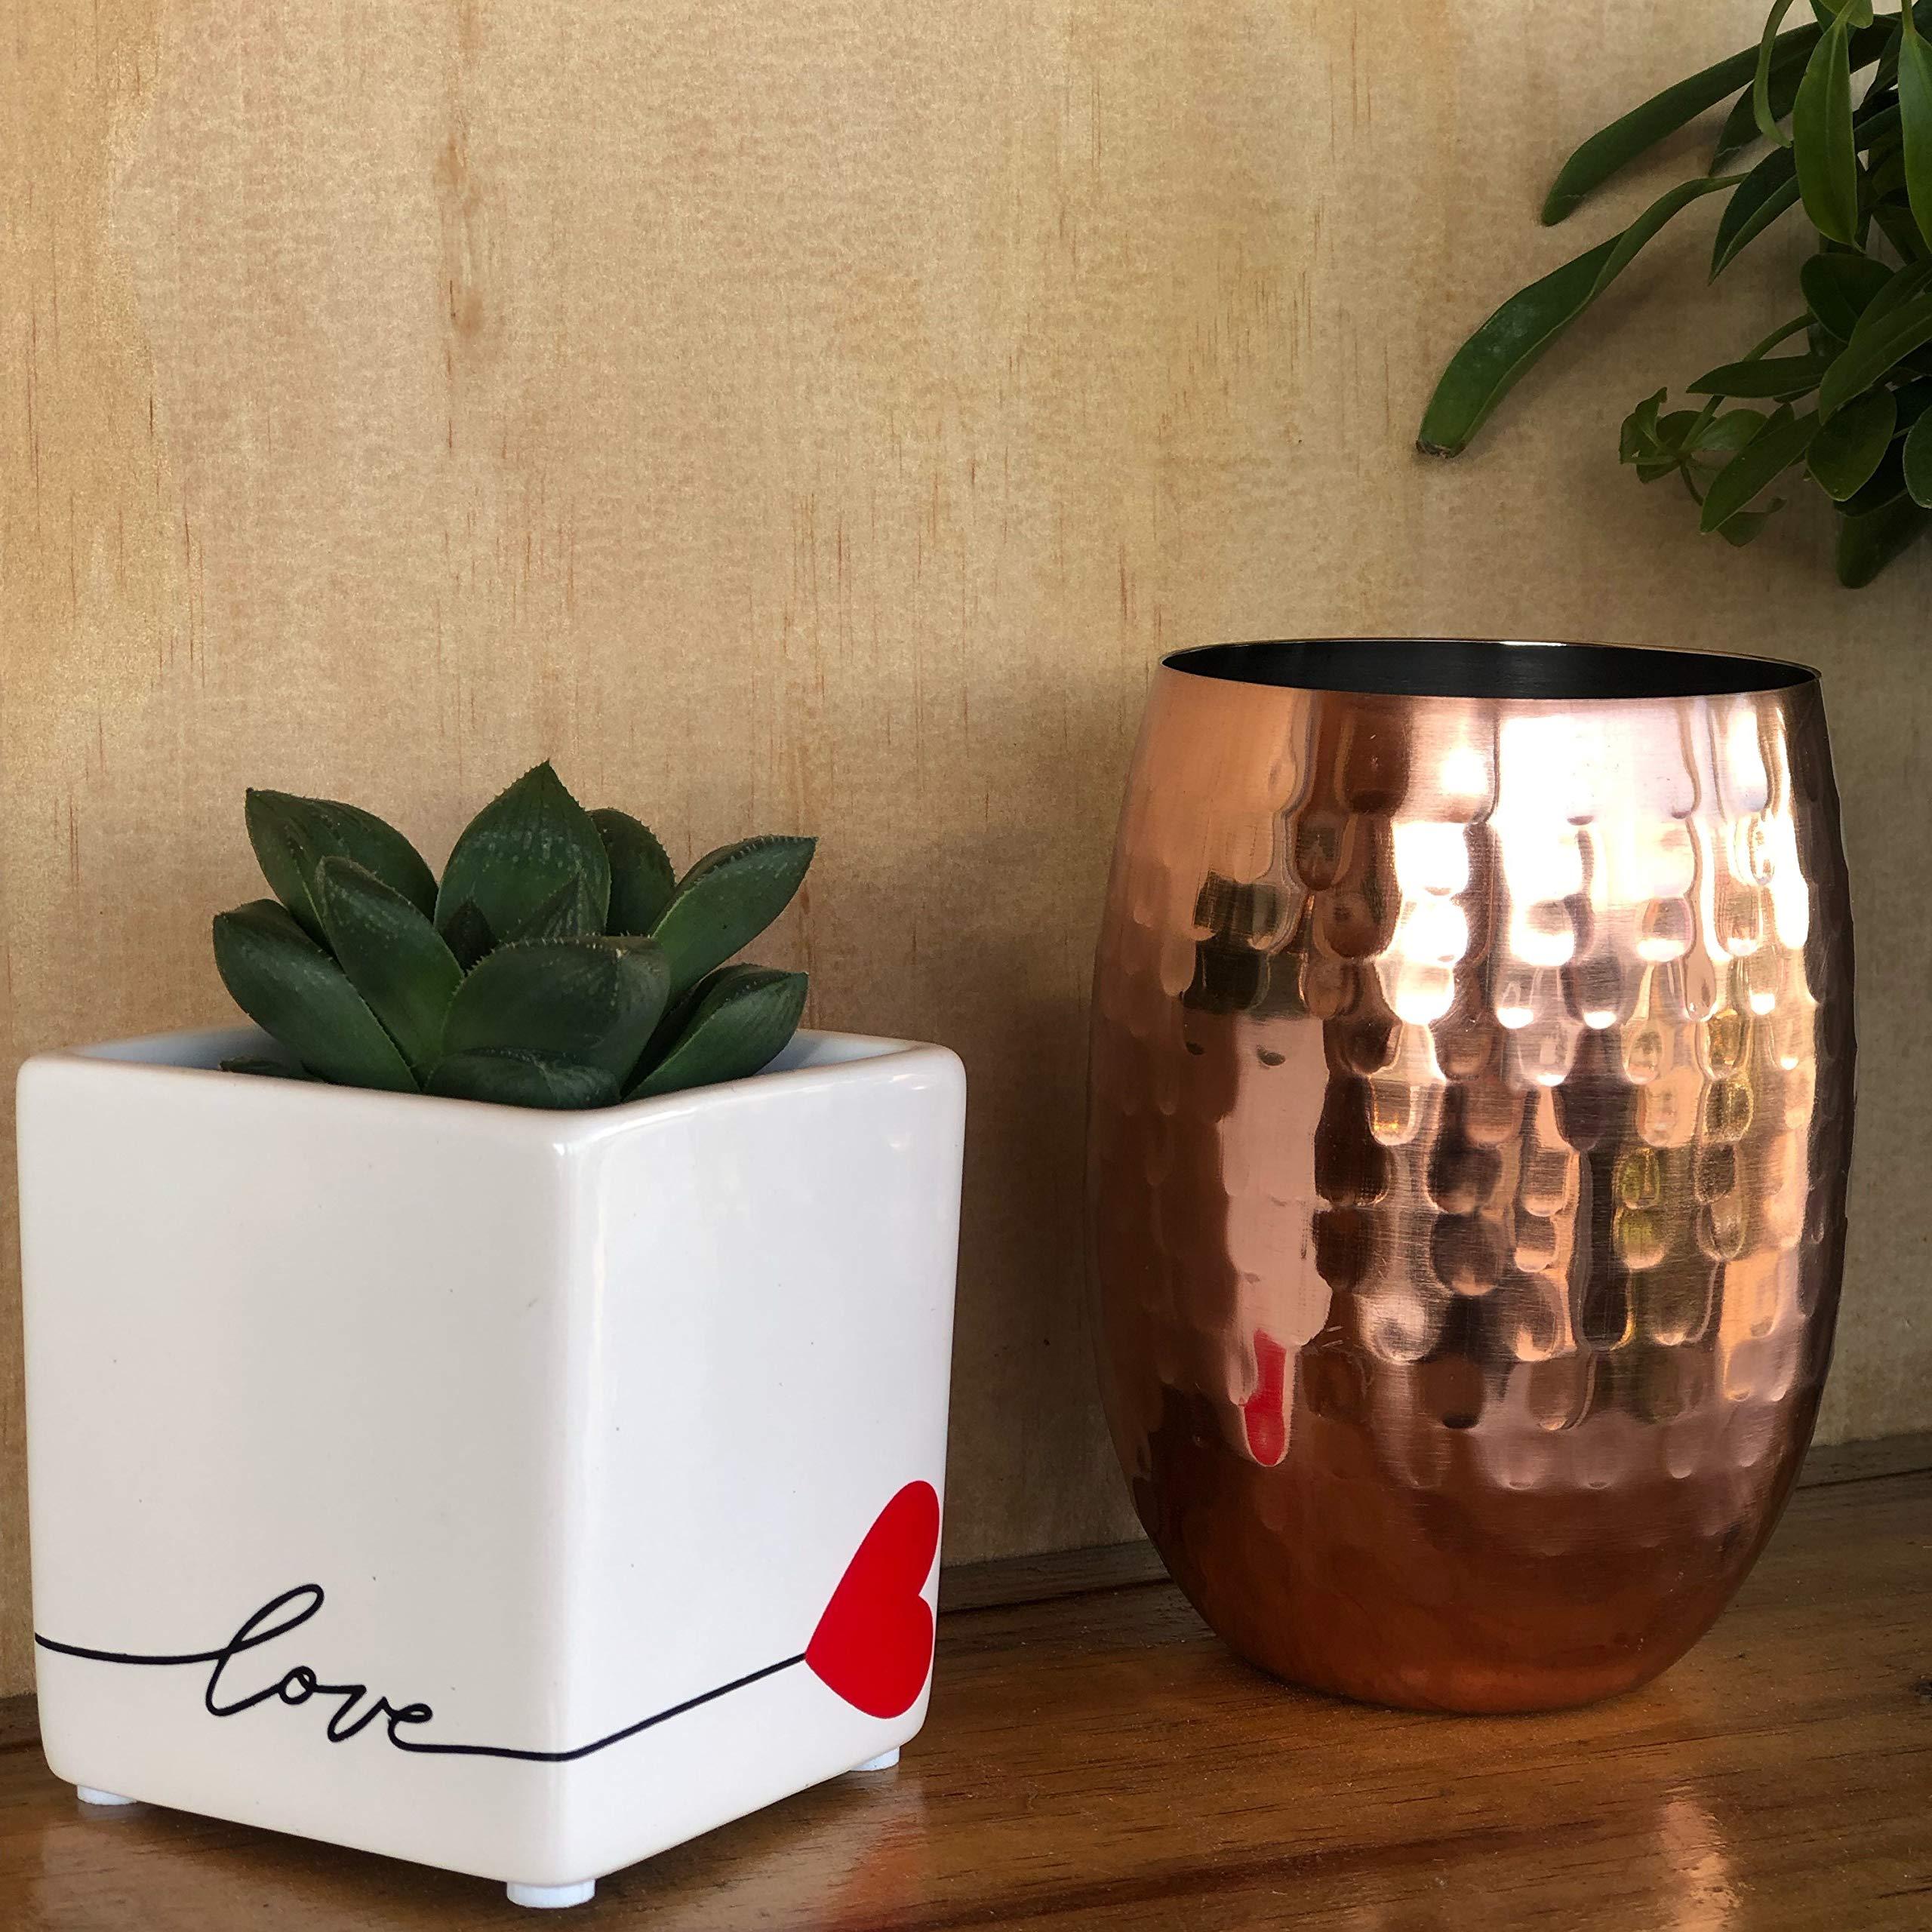 Costa Farms Live Mini Aloe Plant, Grower's Choice, in Love Balloon Ceramic by Costa Farms (Image #4)